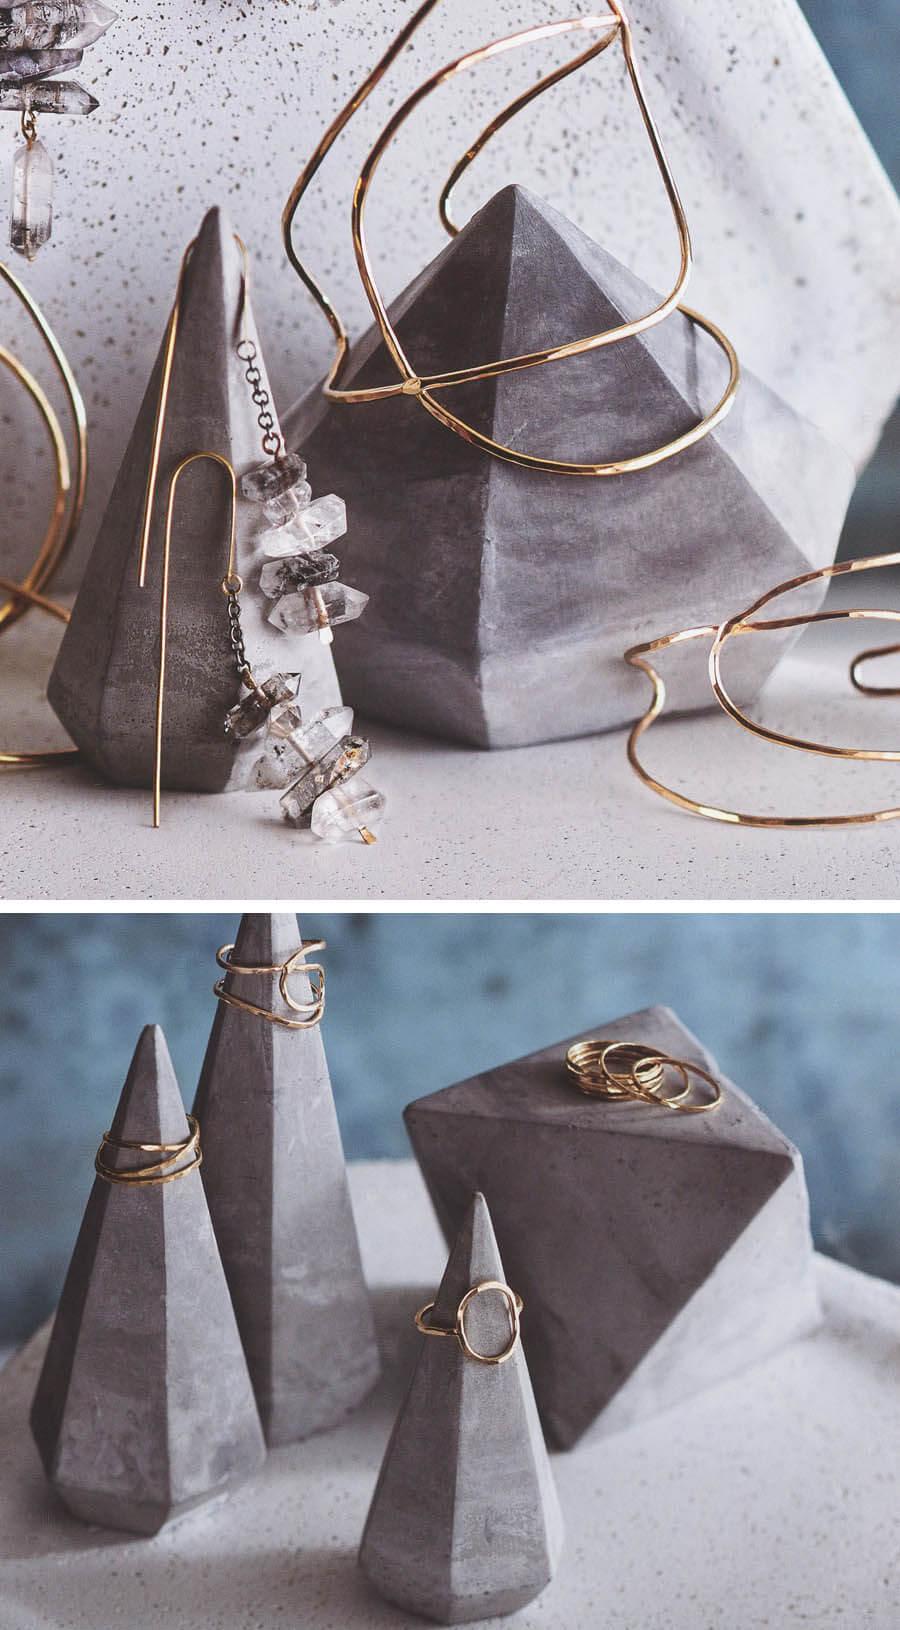 Marais Contemporary Jewelry Display - photo#36